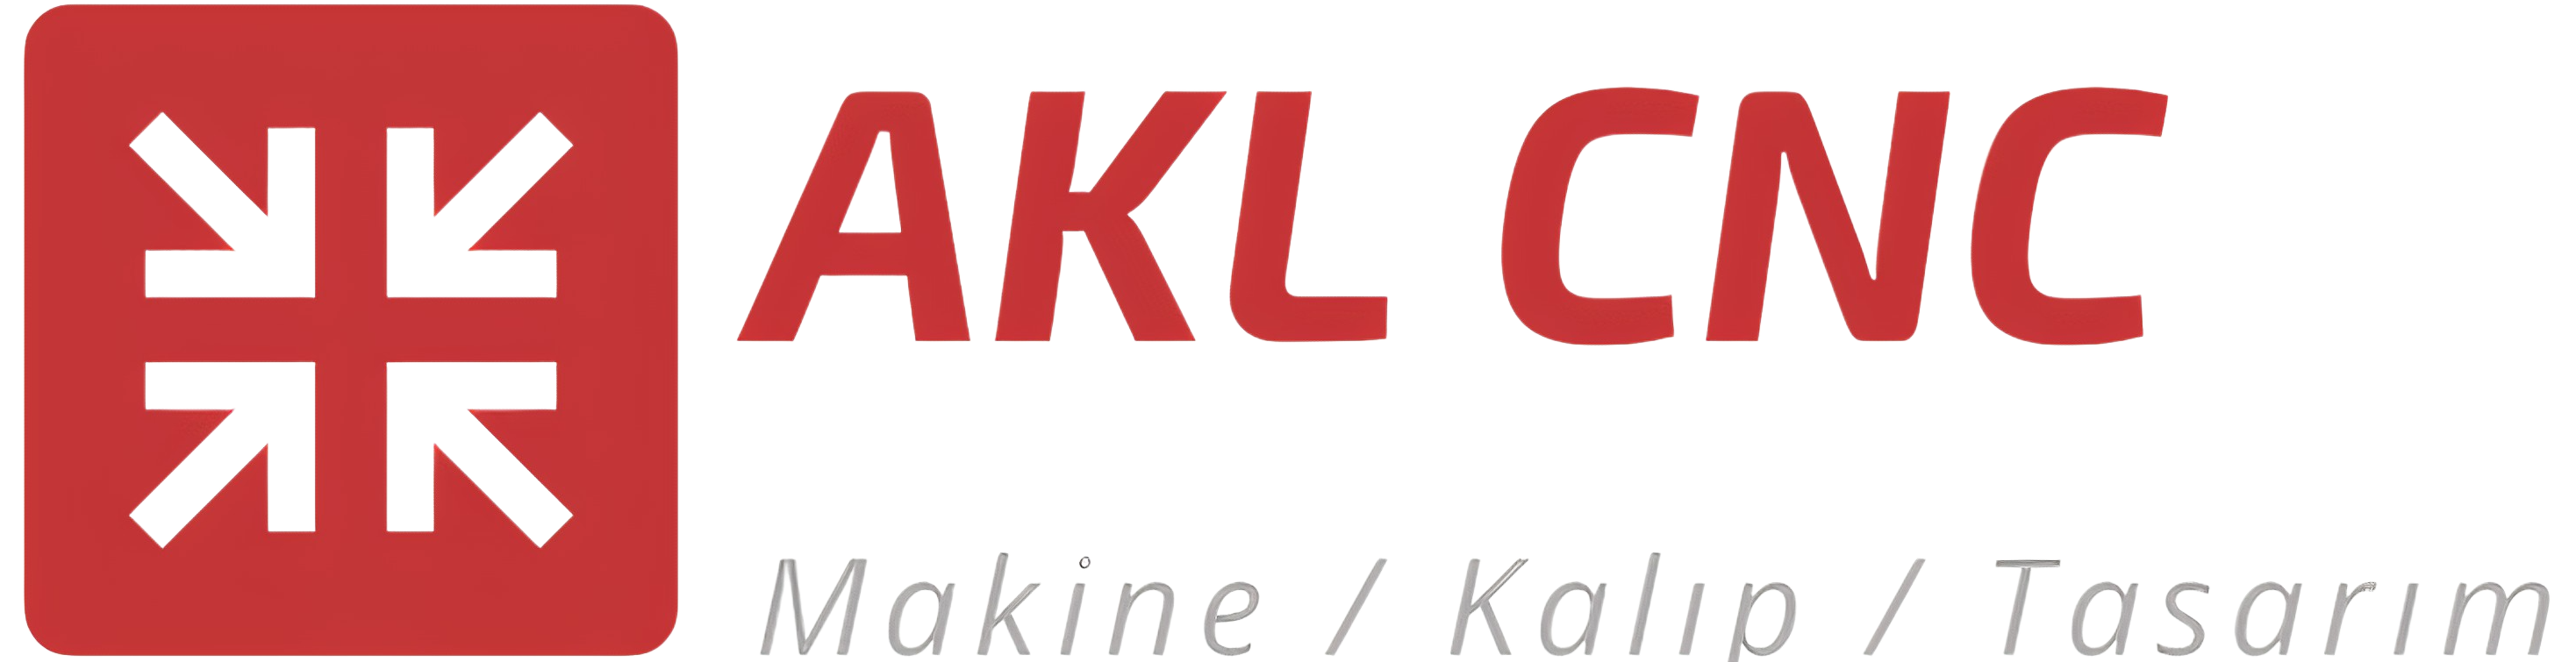 AKL CNC - 2021